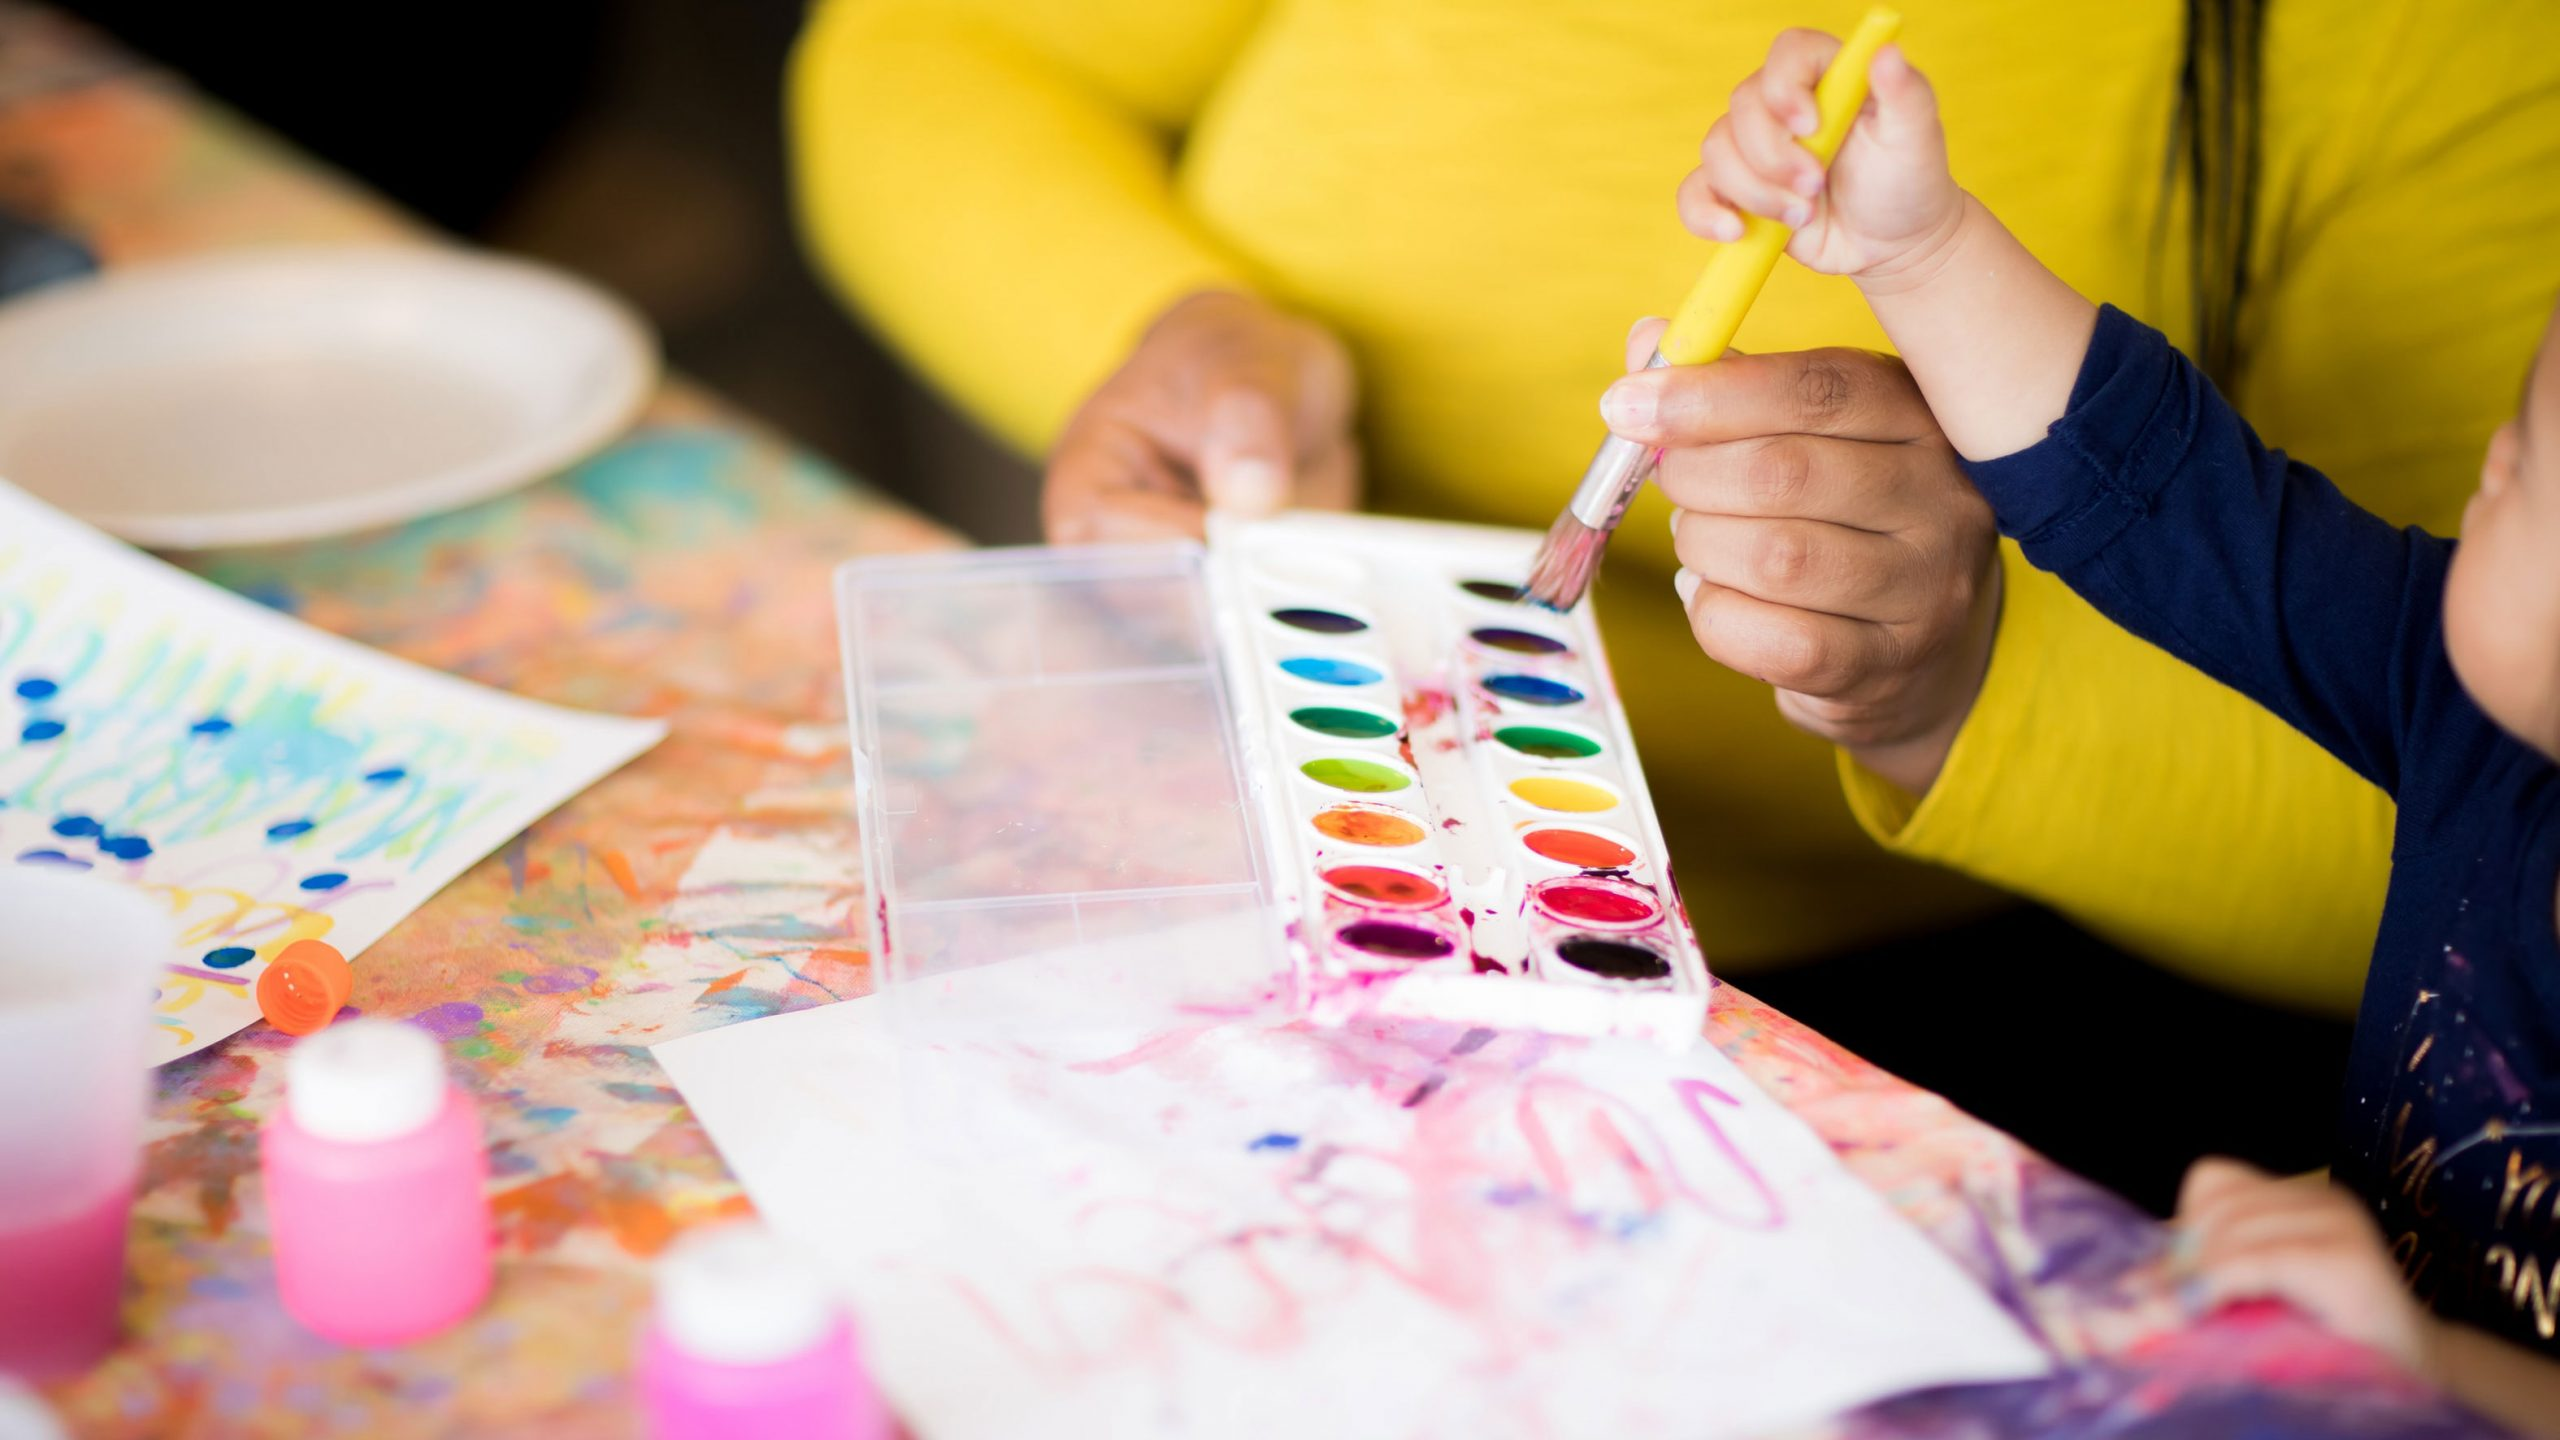 creative ways to display kids artwork, child painting